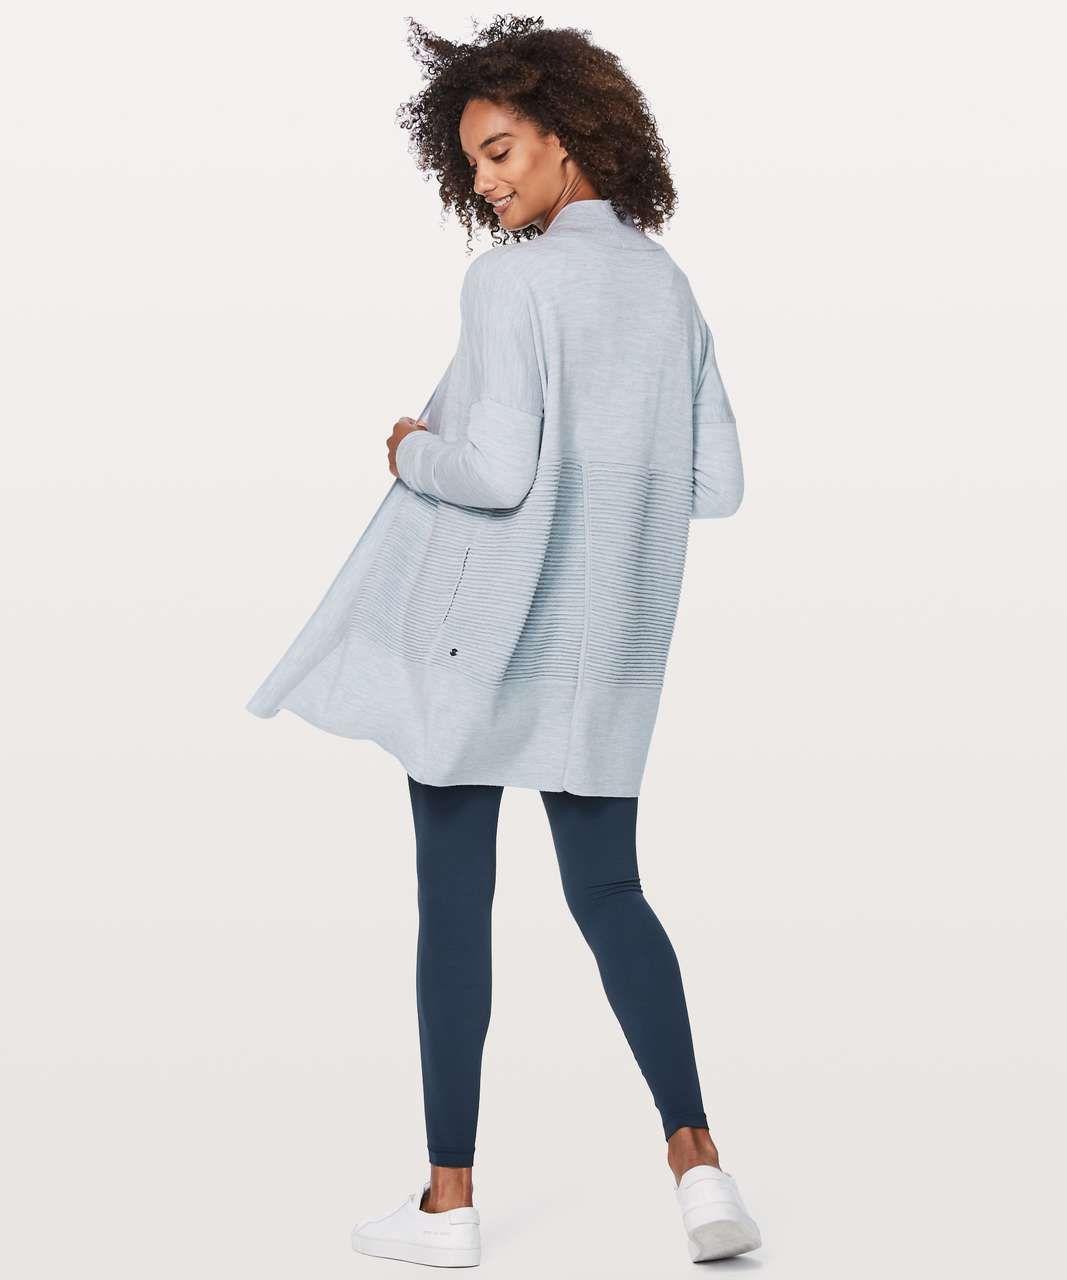 Lotus Wool Sweater with Fleece Lining